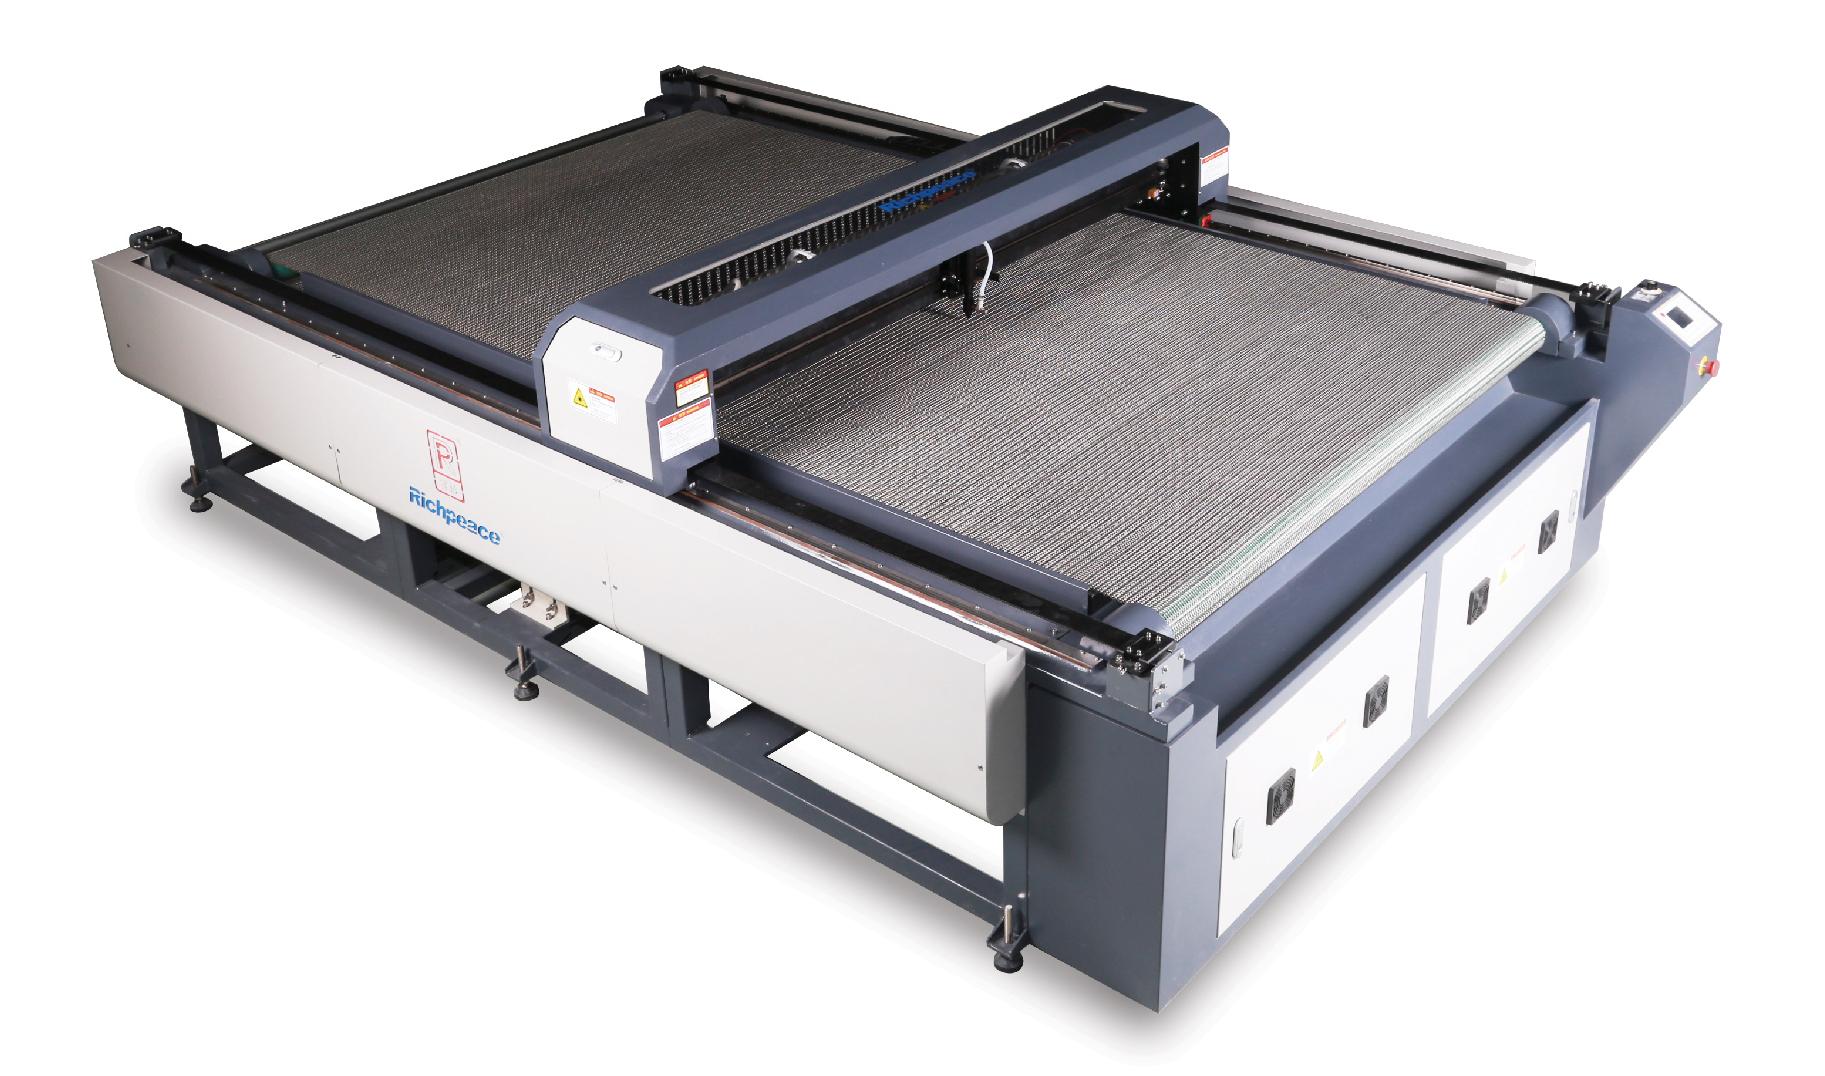 Richpeace Laser Cutting Machine for Big Size